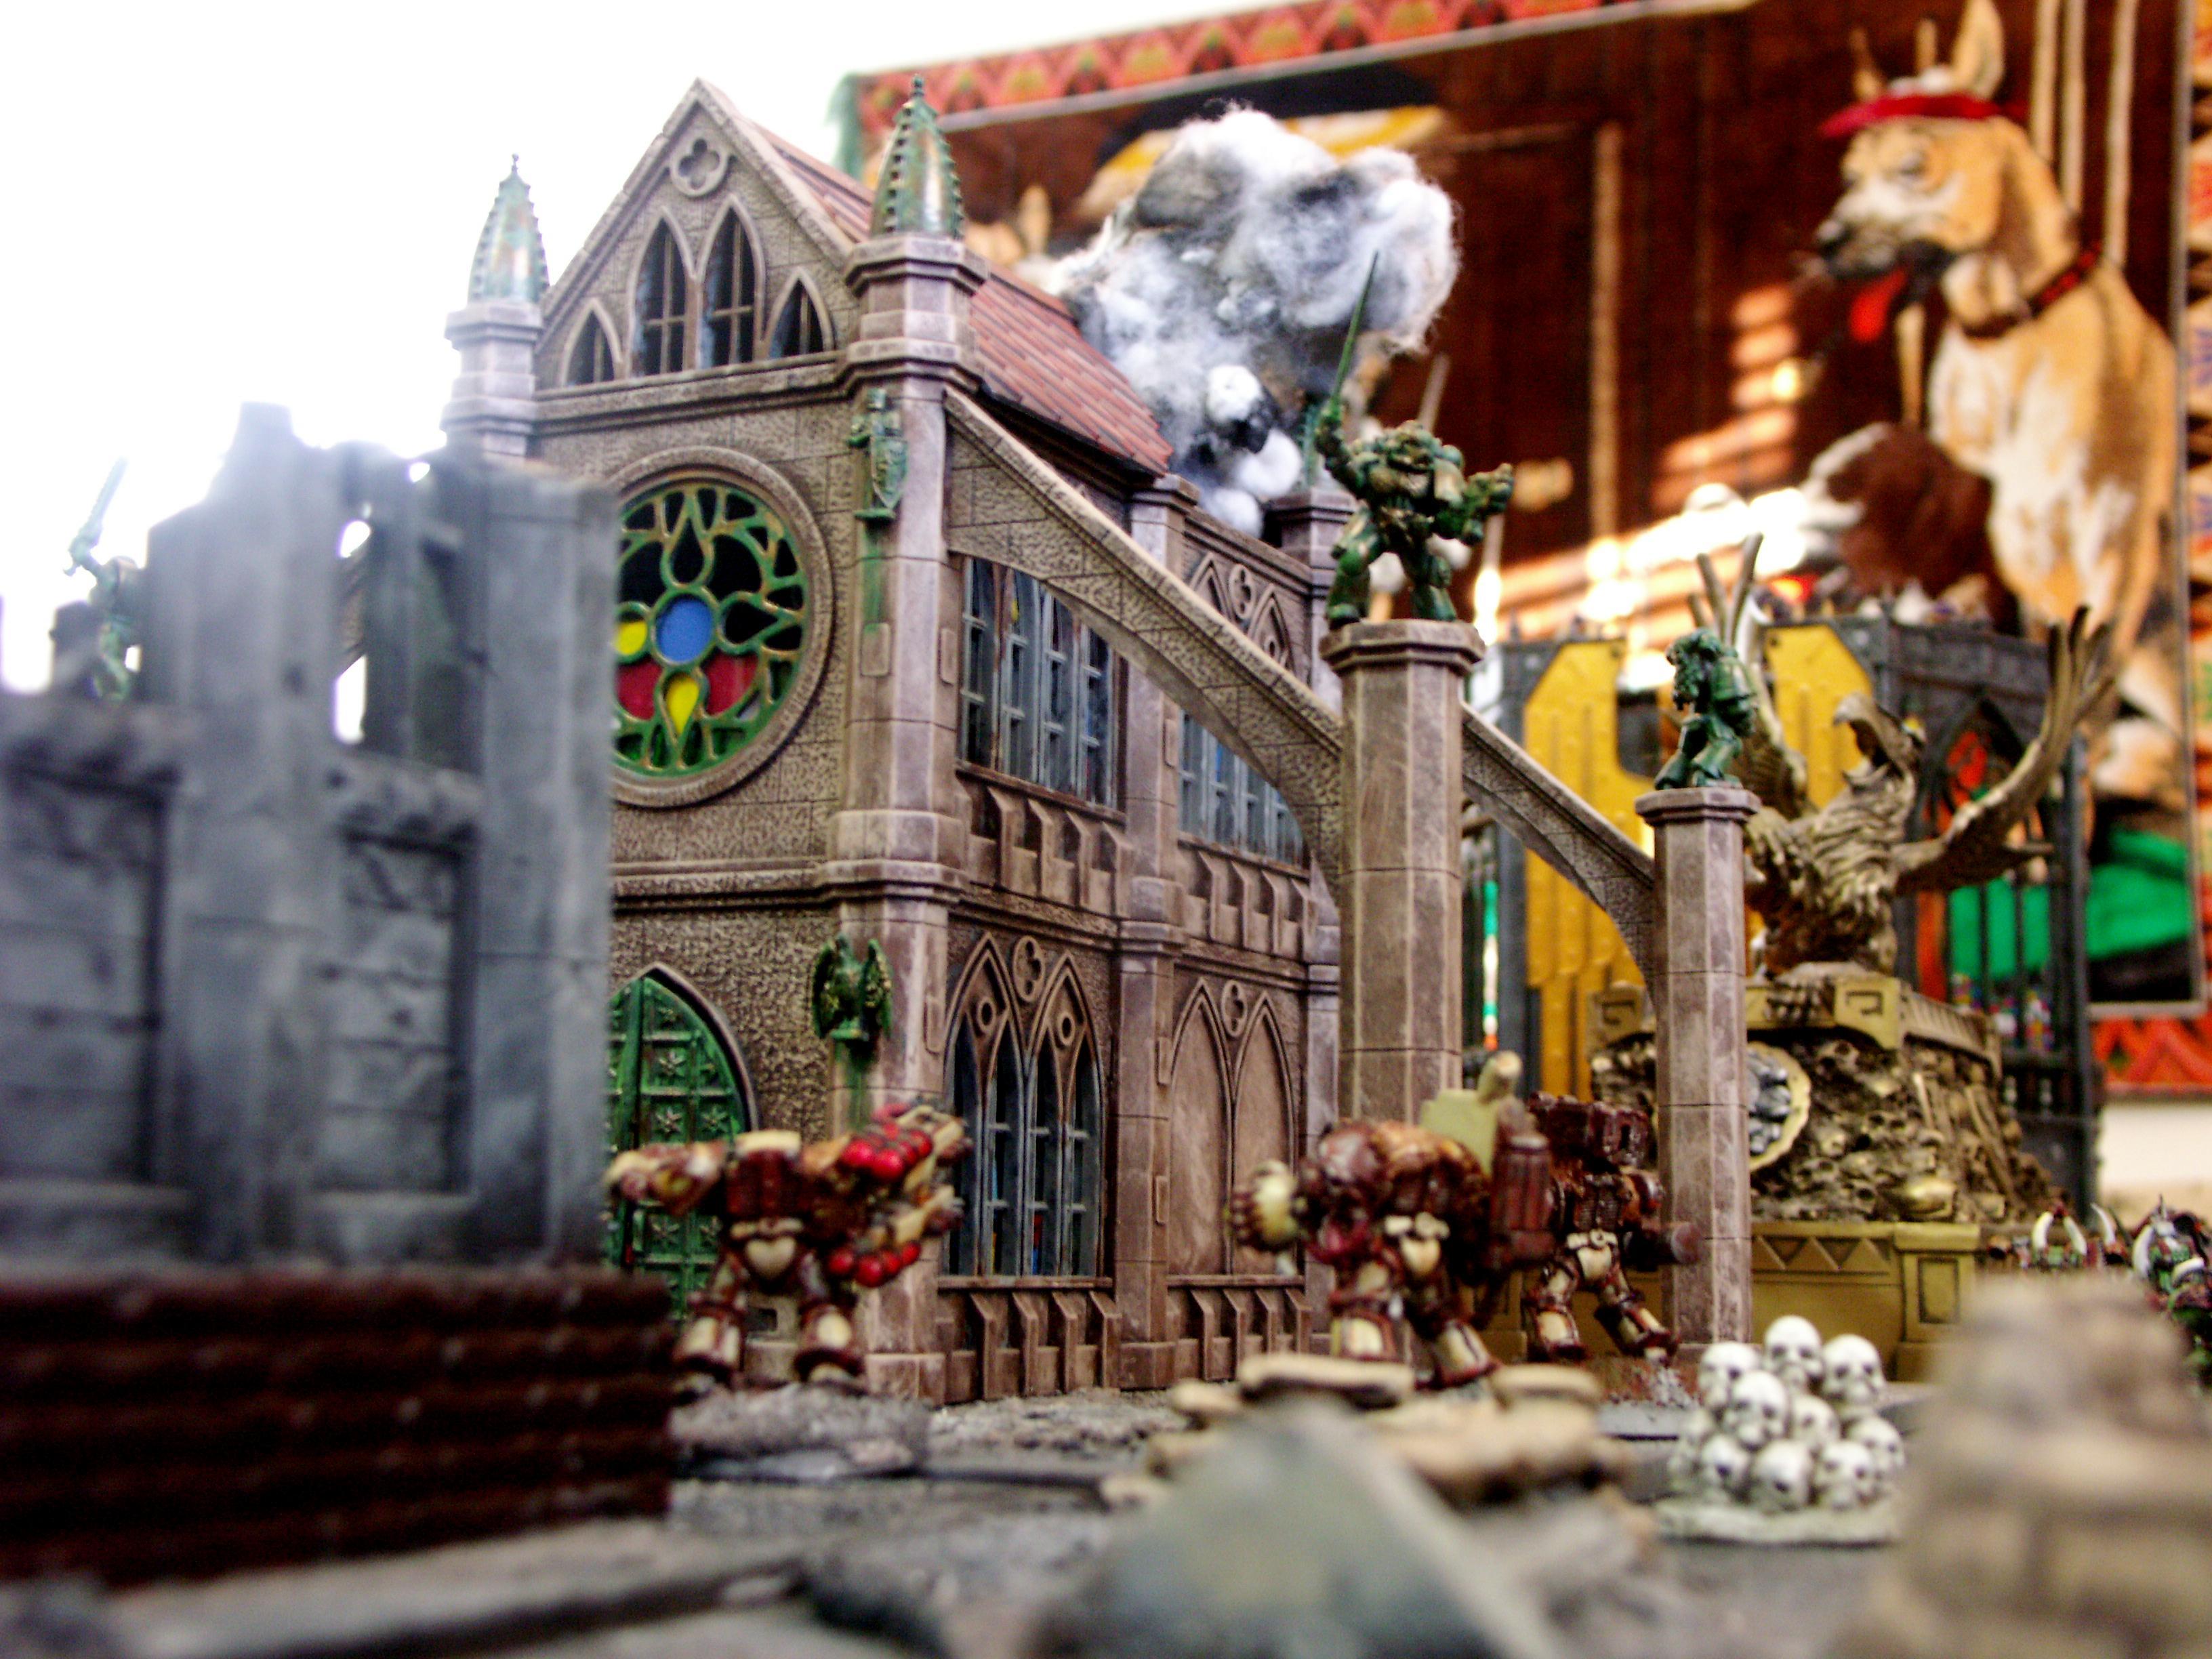 Cathedral, Pegasus, Temple, Terrain